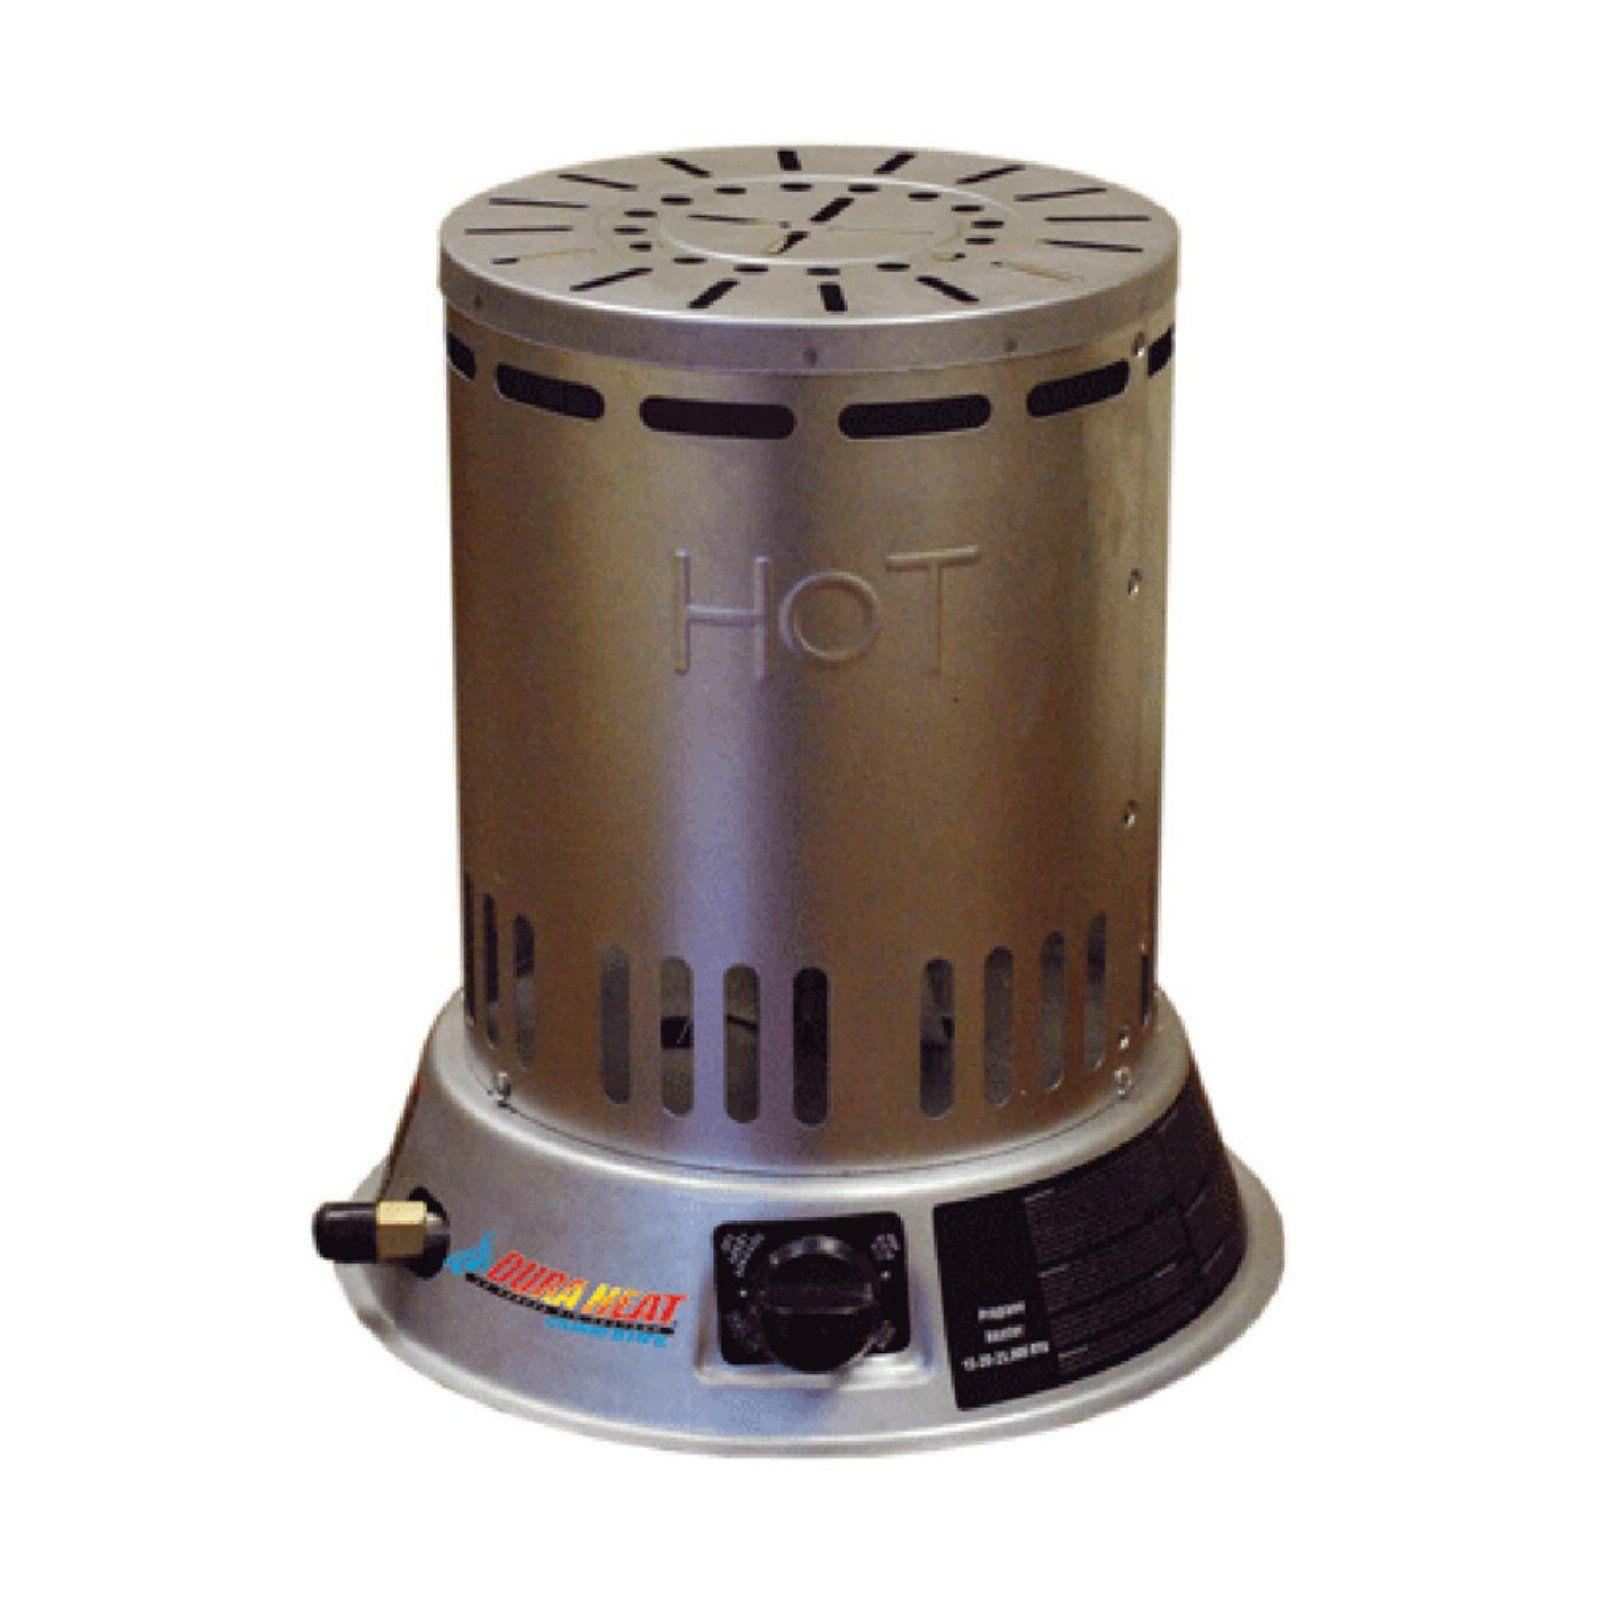 Dura Heat LPC25 Propane Convection Utility Heater